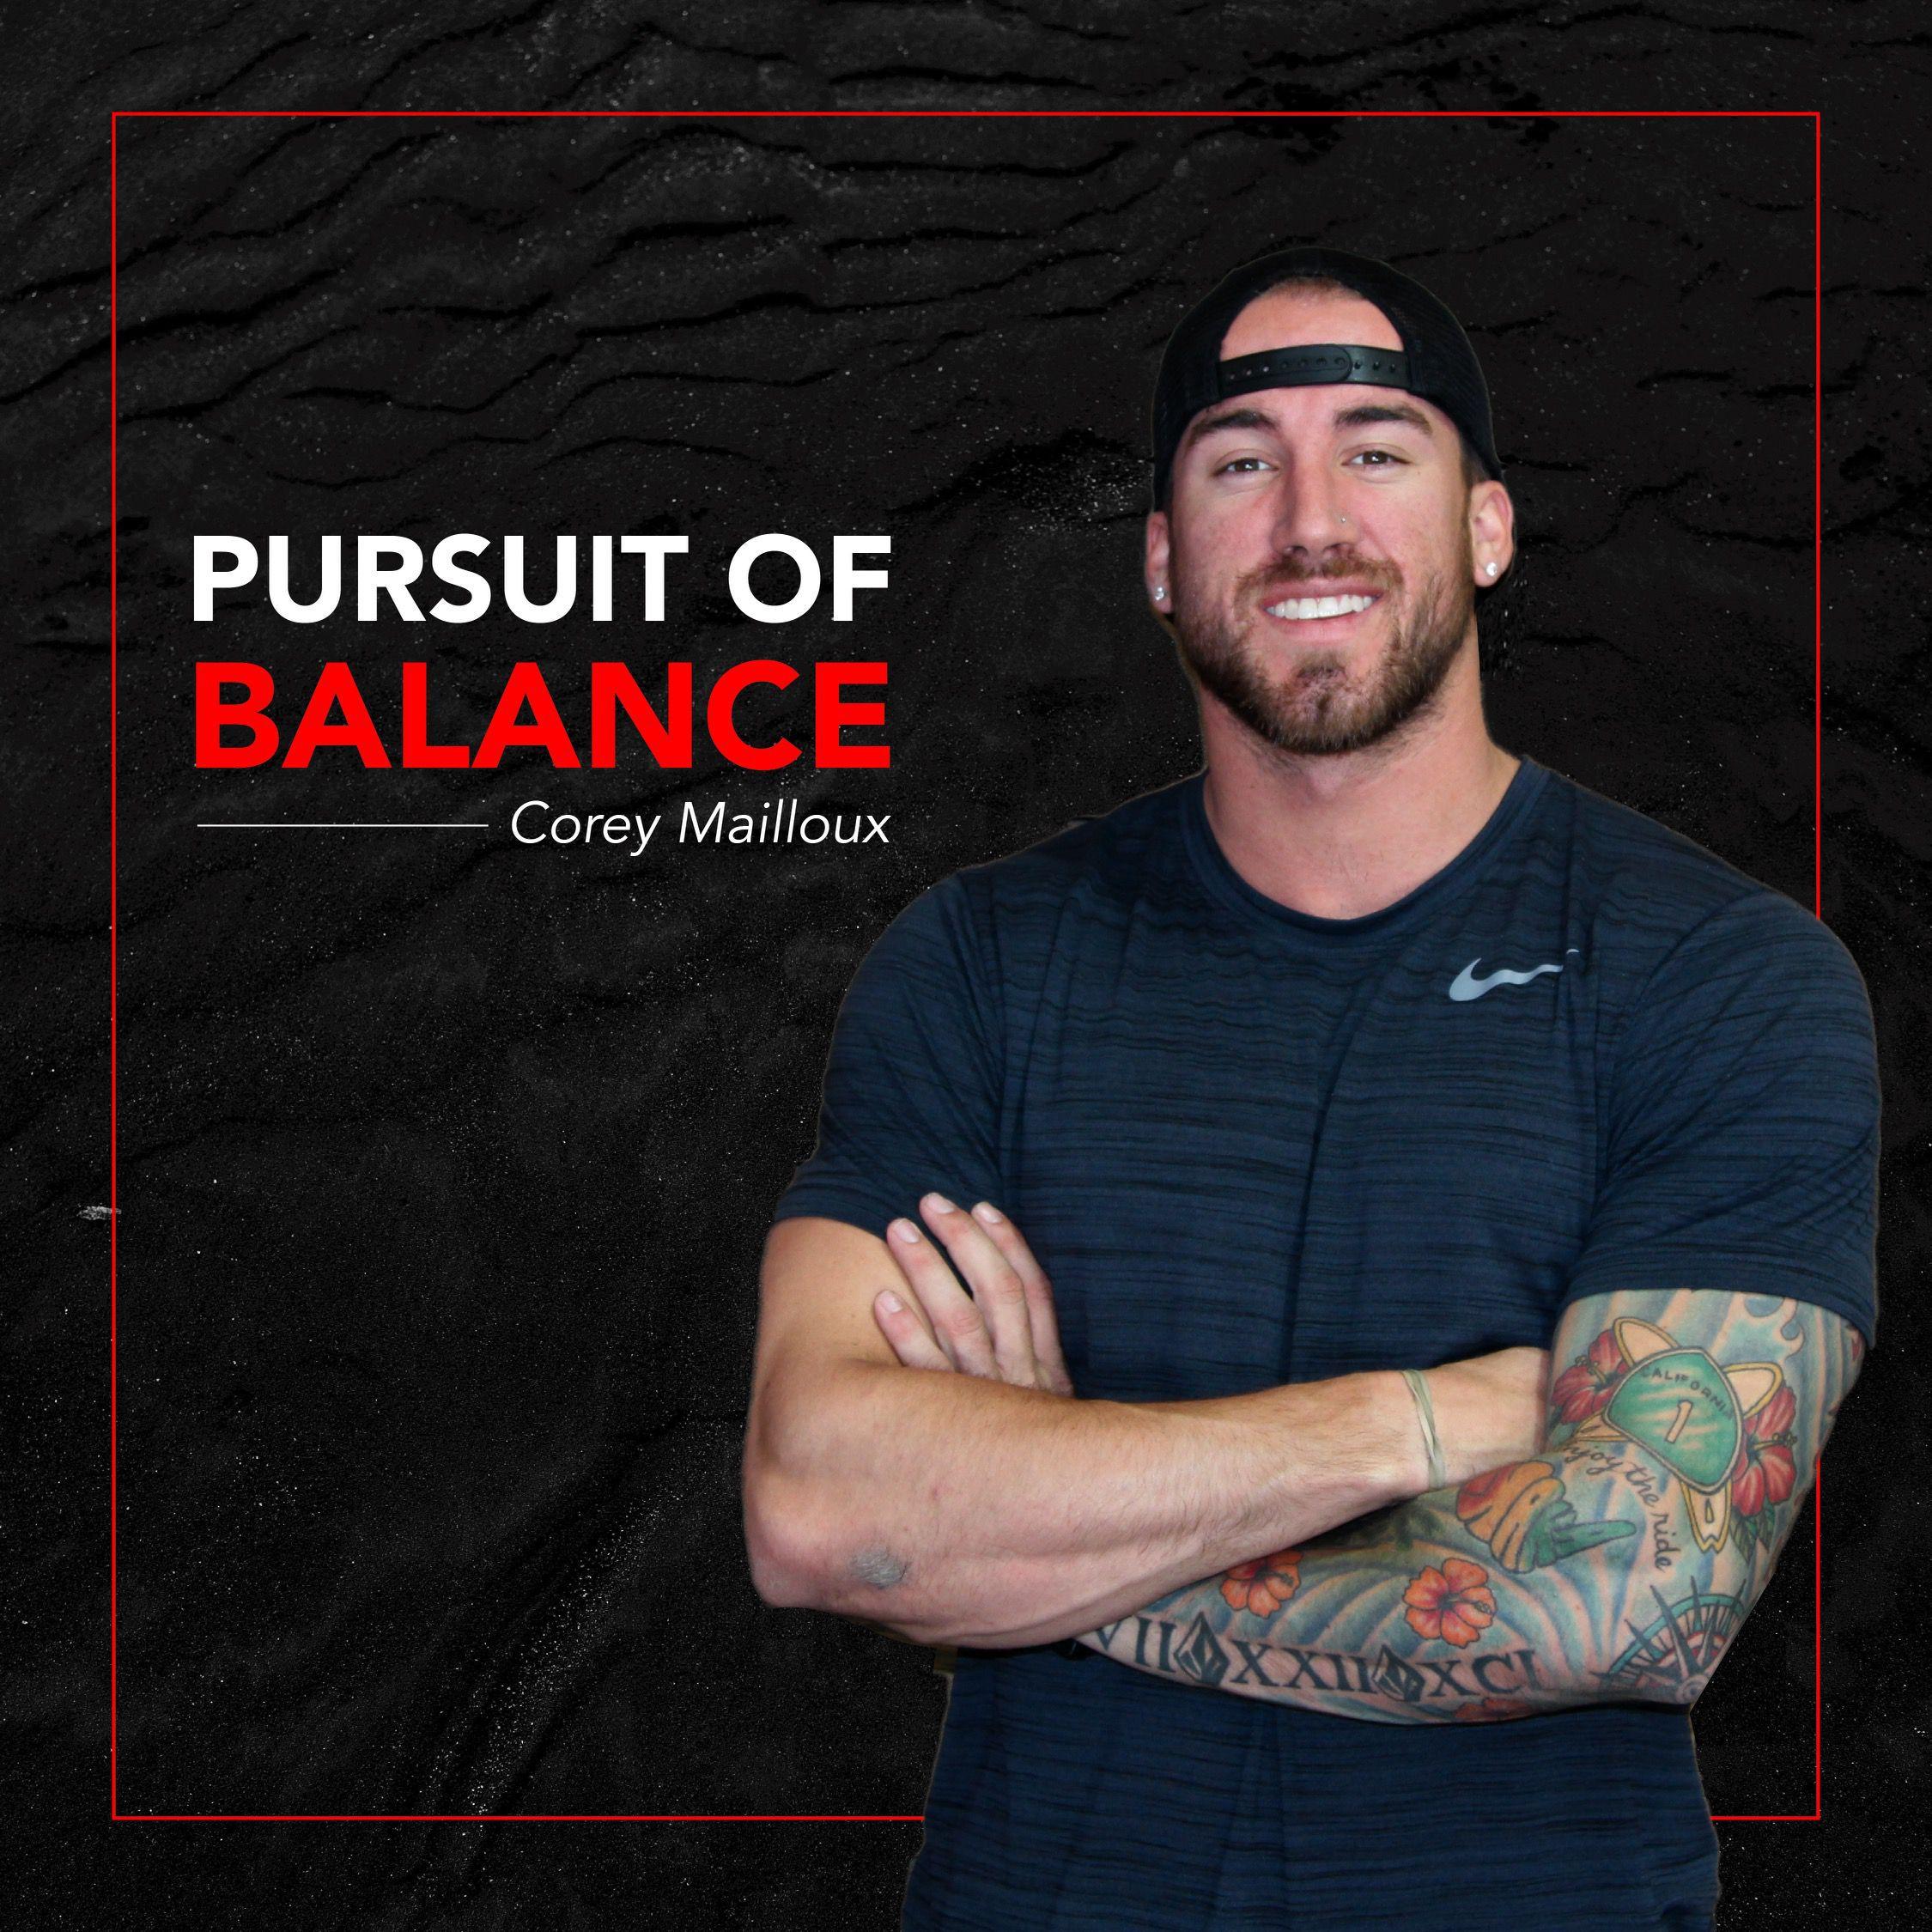 Pursuit of Balance